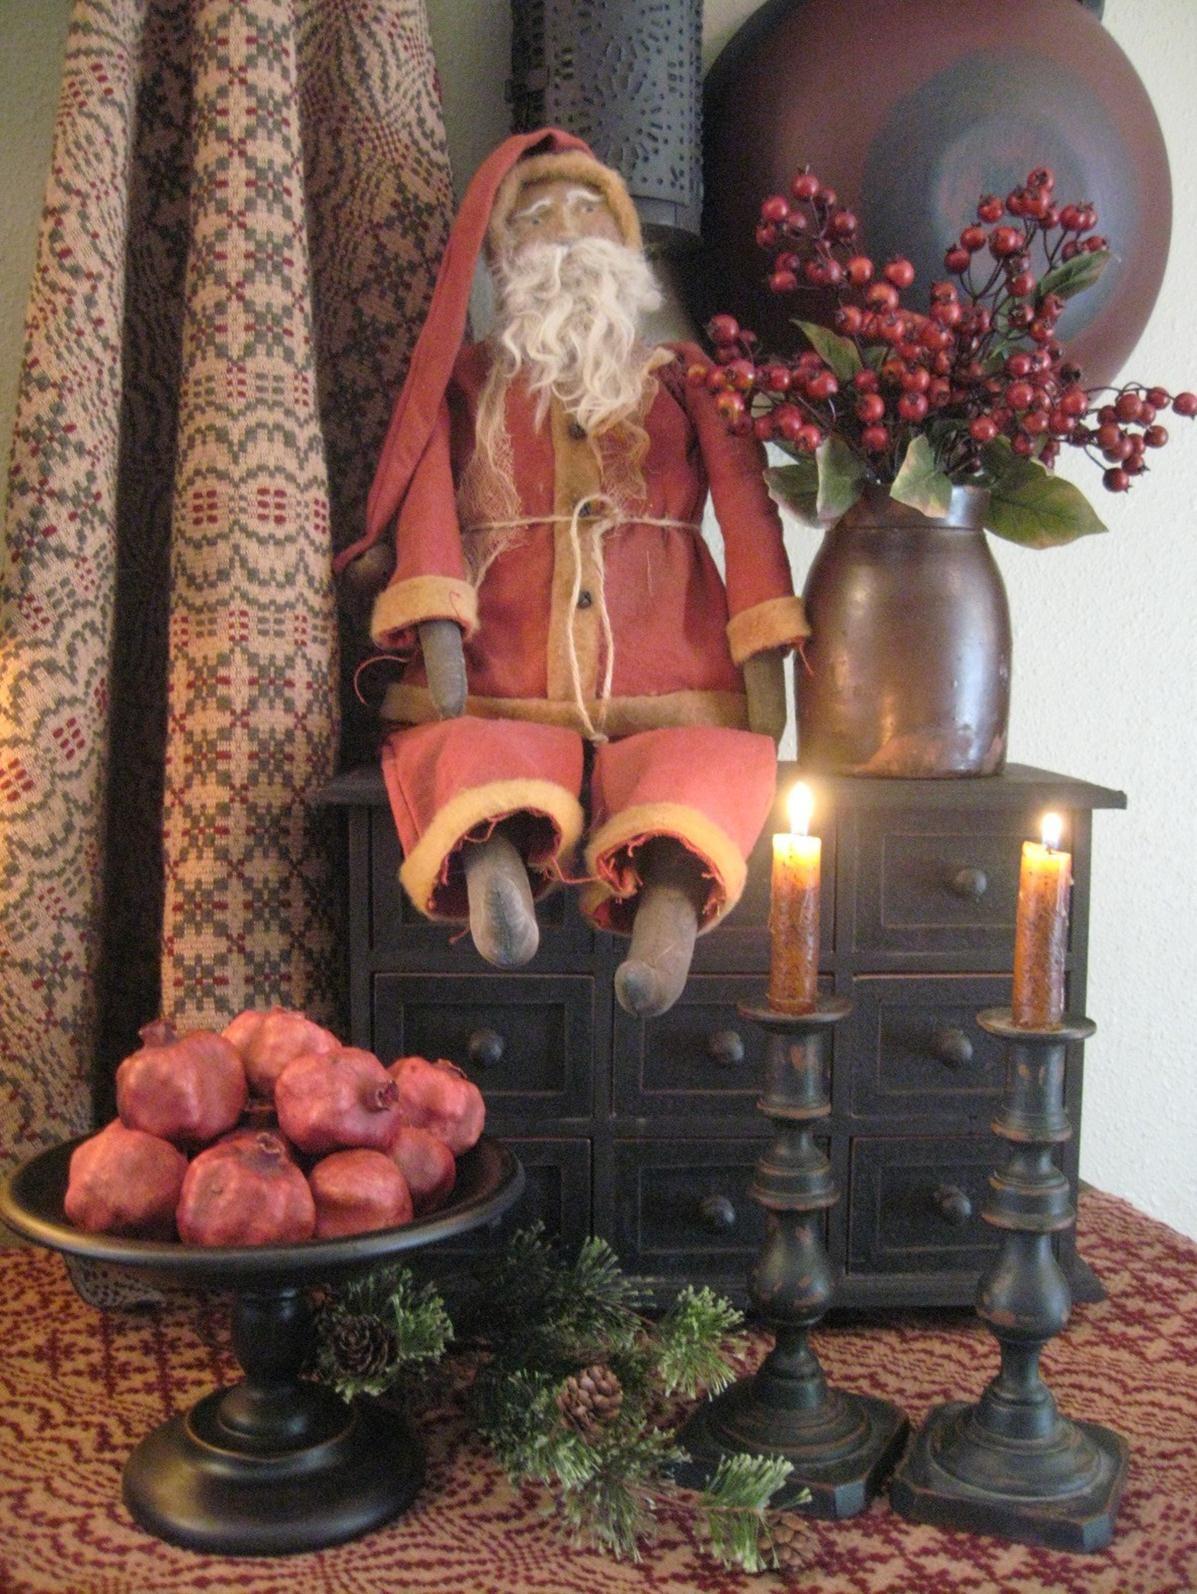 Primitive christmas decor pinterest - The Magic Of Christmas Primitive Christmas Decoratingprimitive